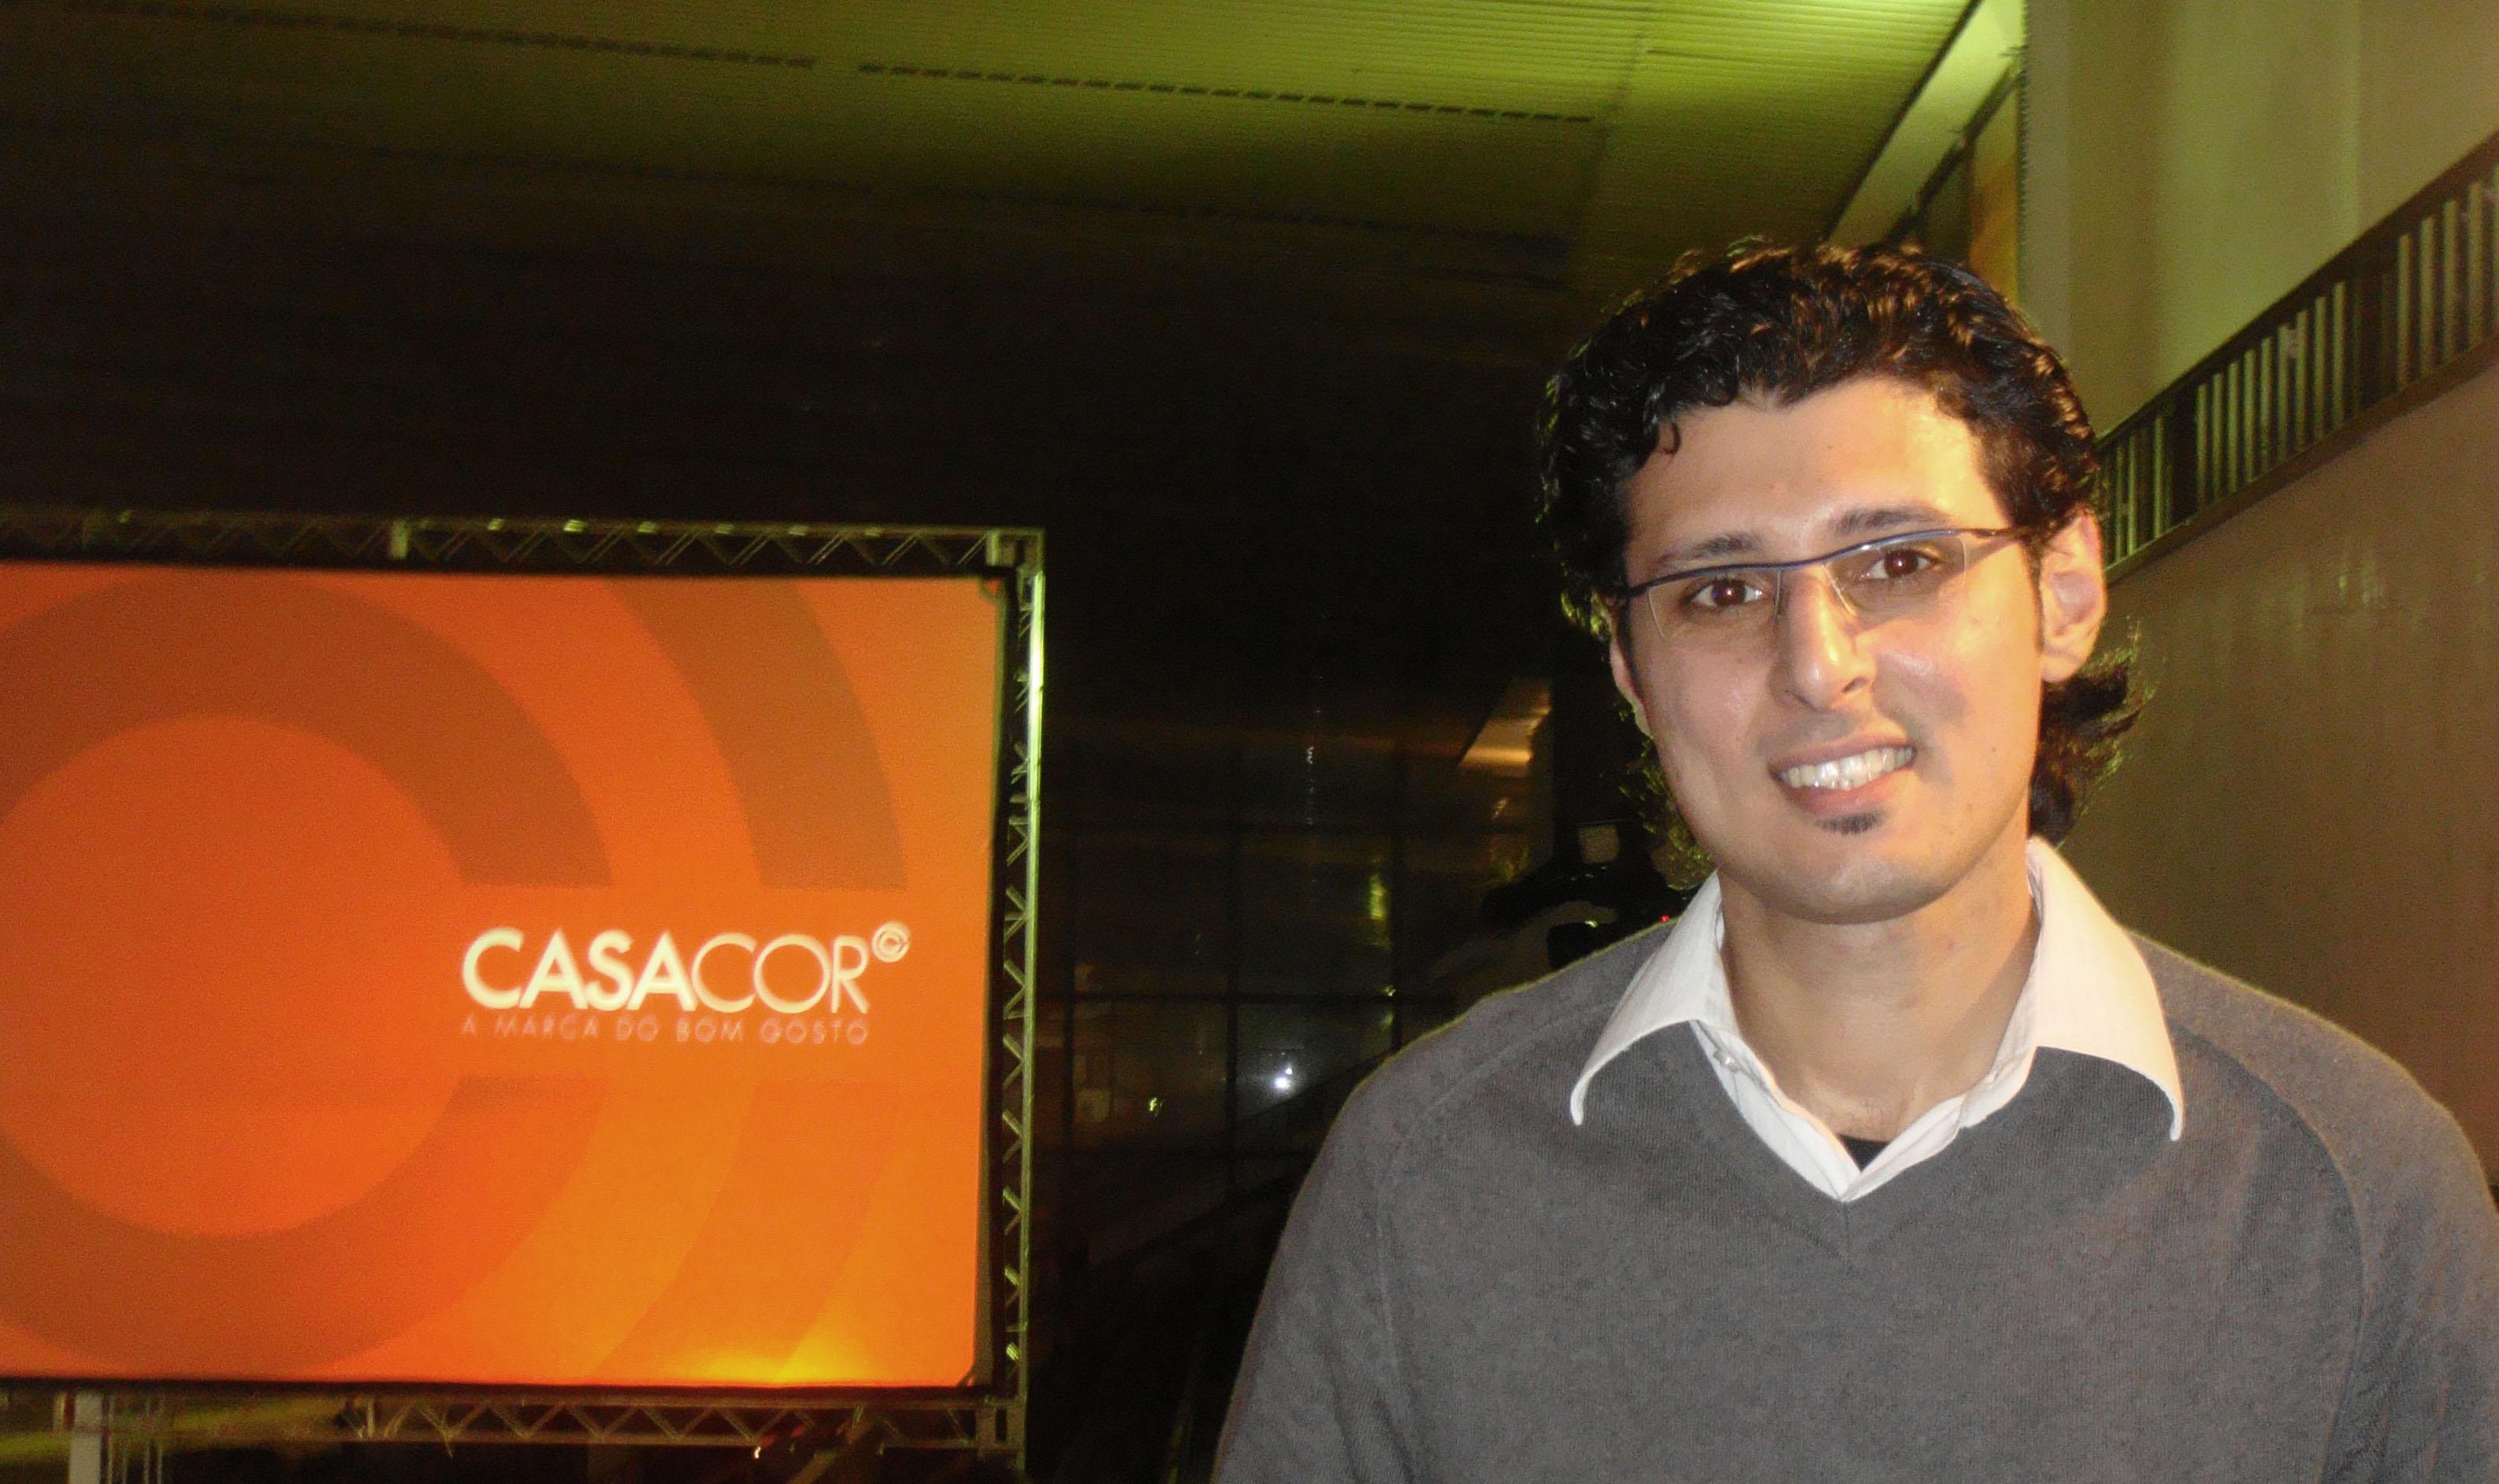 Casa cor 2012 Sao Paulo_ Brazil